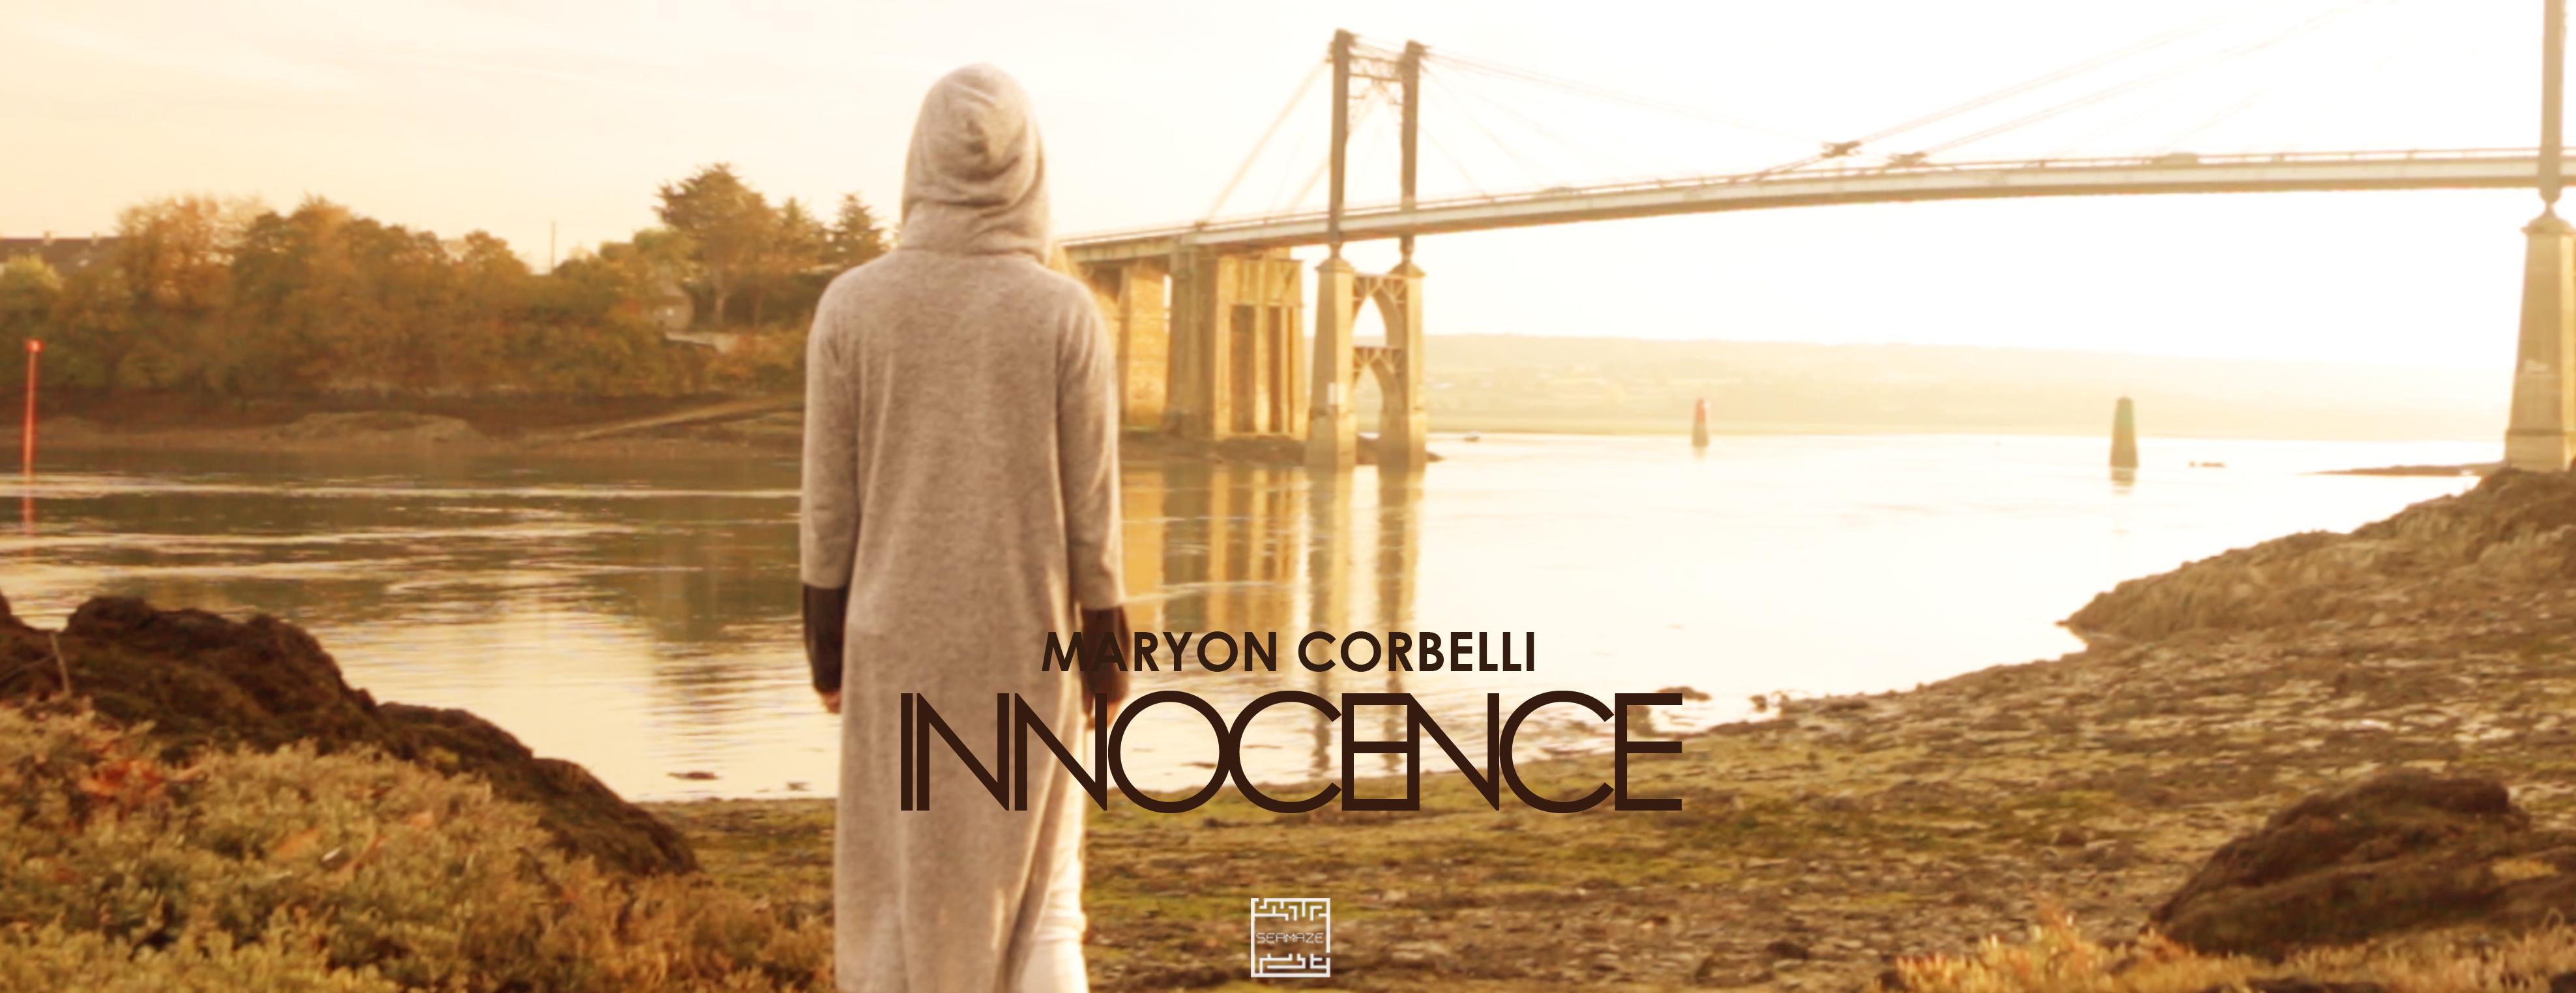 banniere-maryon-corbelli-11-innocence